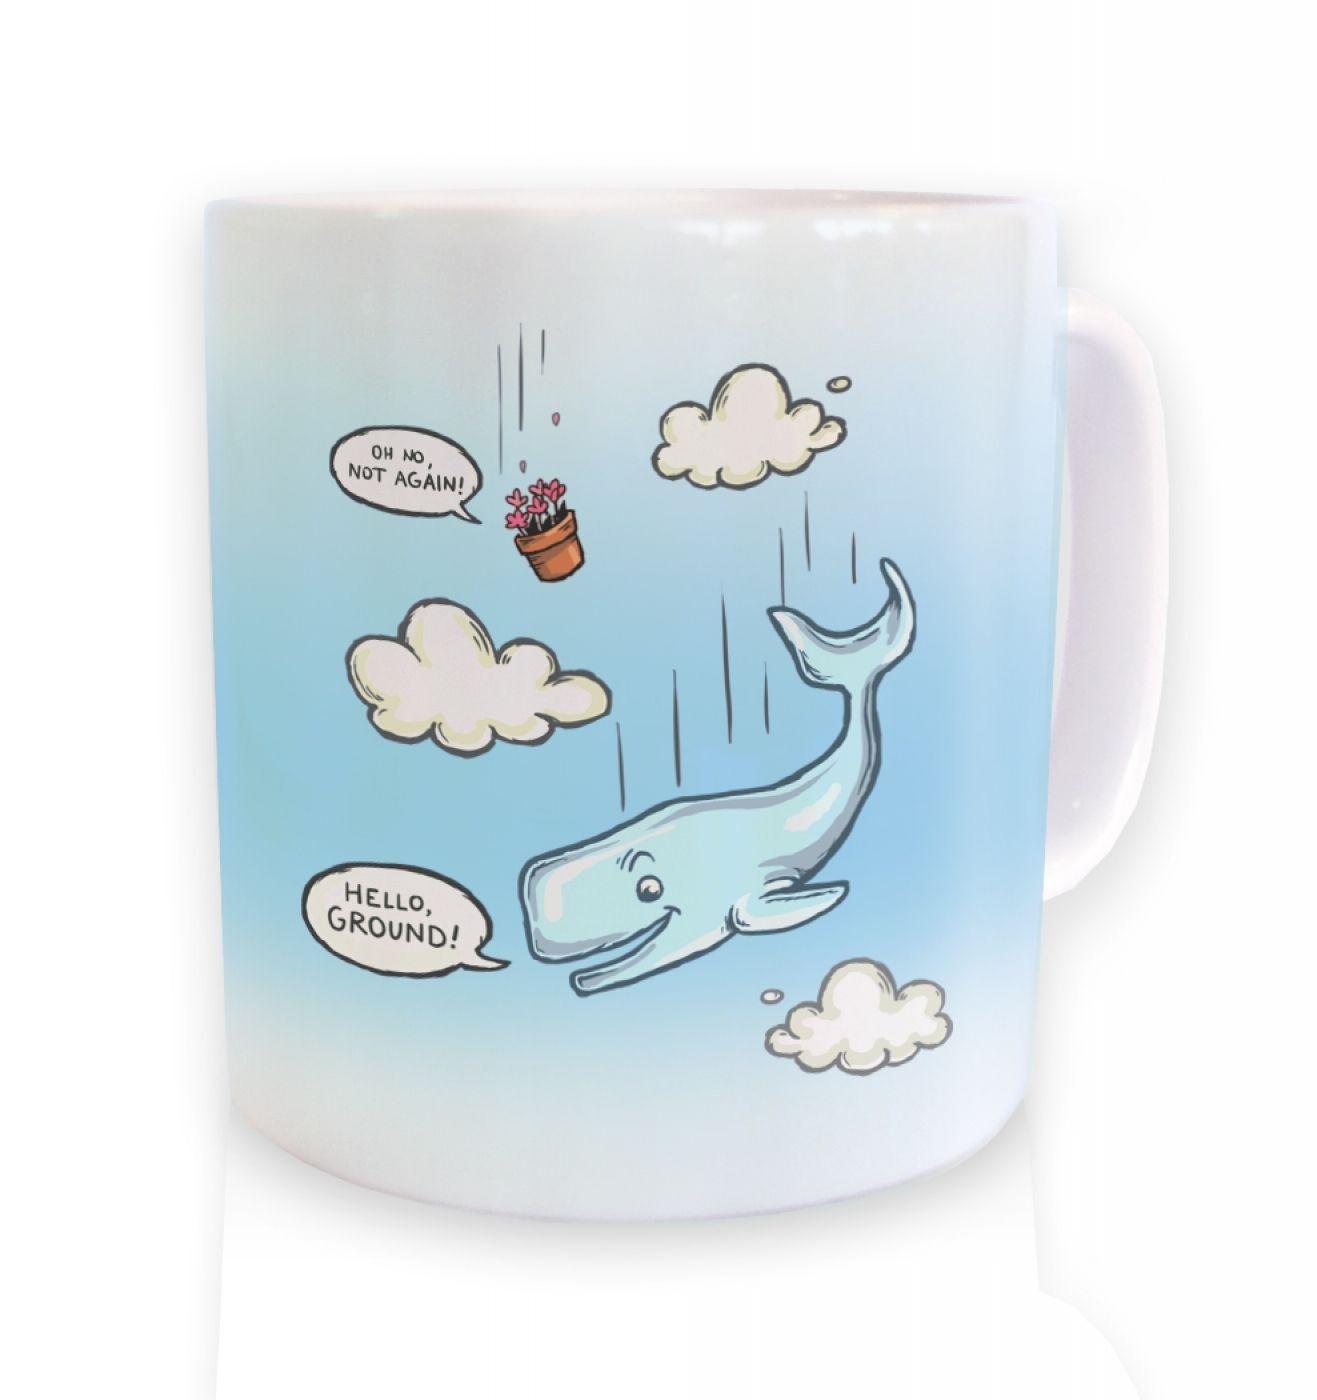 Falling Whale ceramic coffee mug